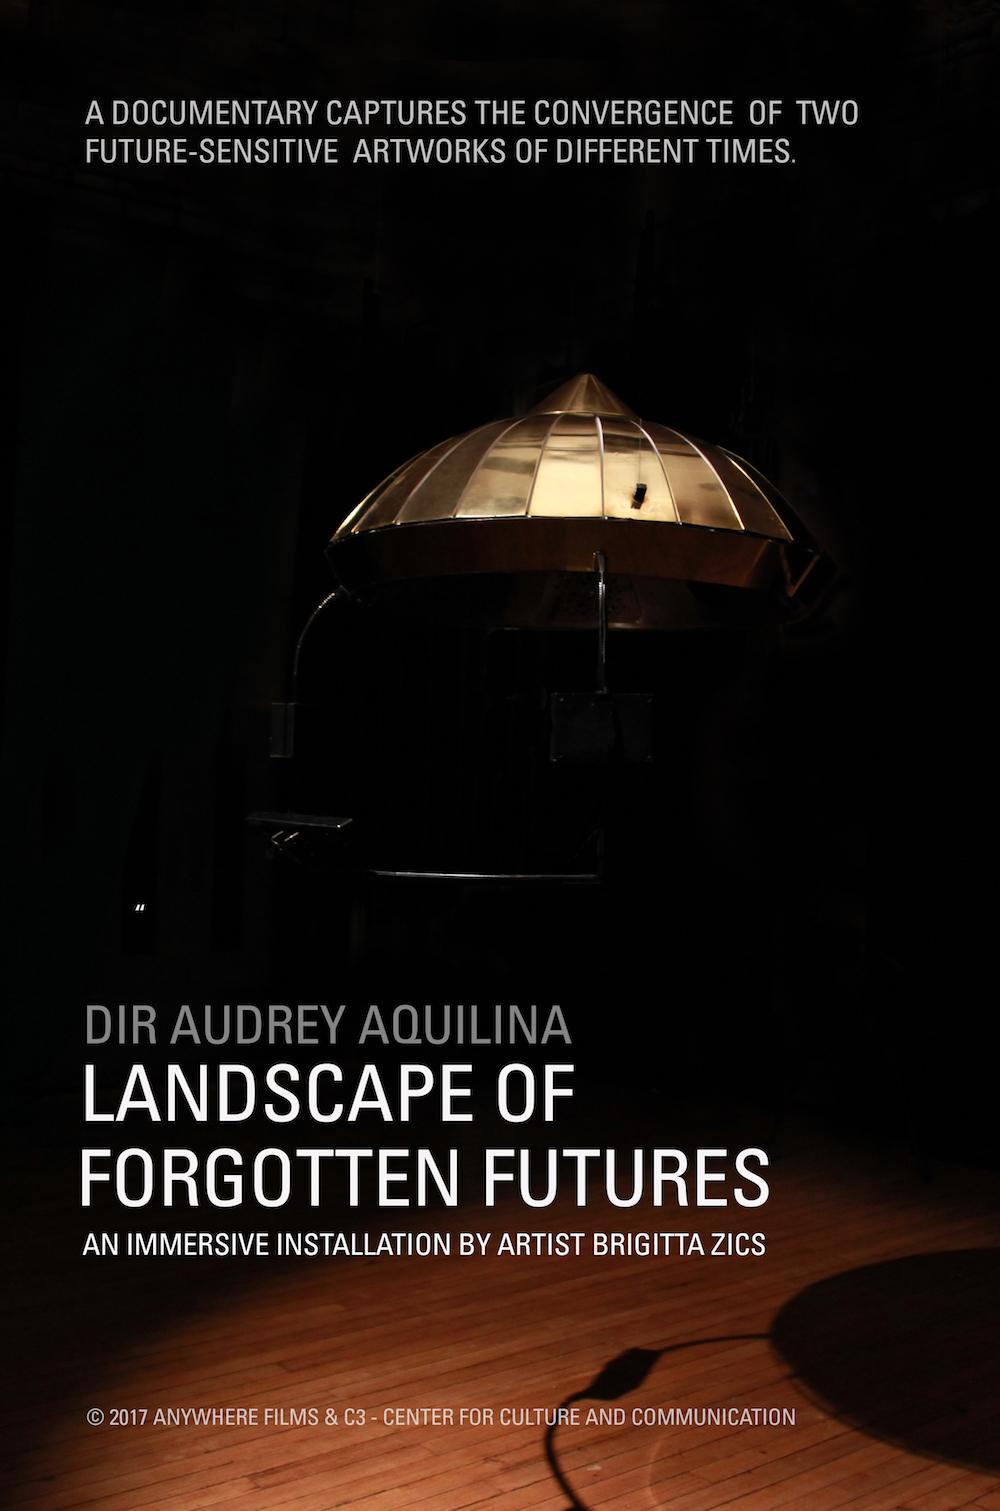 LandscapepfForgottenFutures000